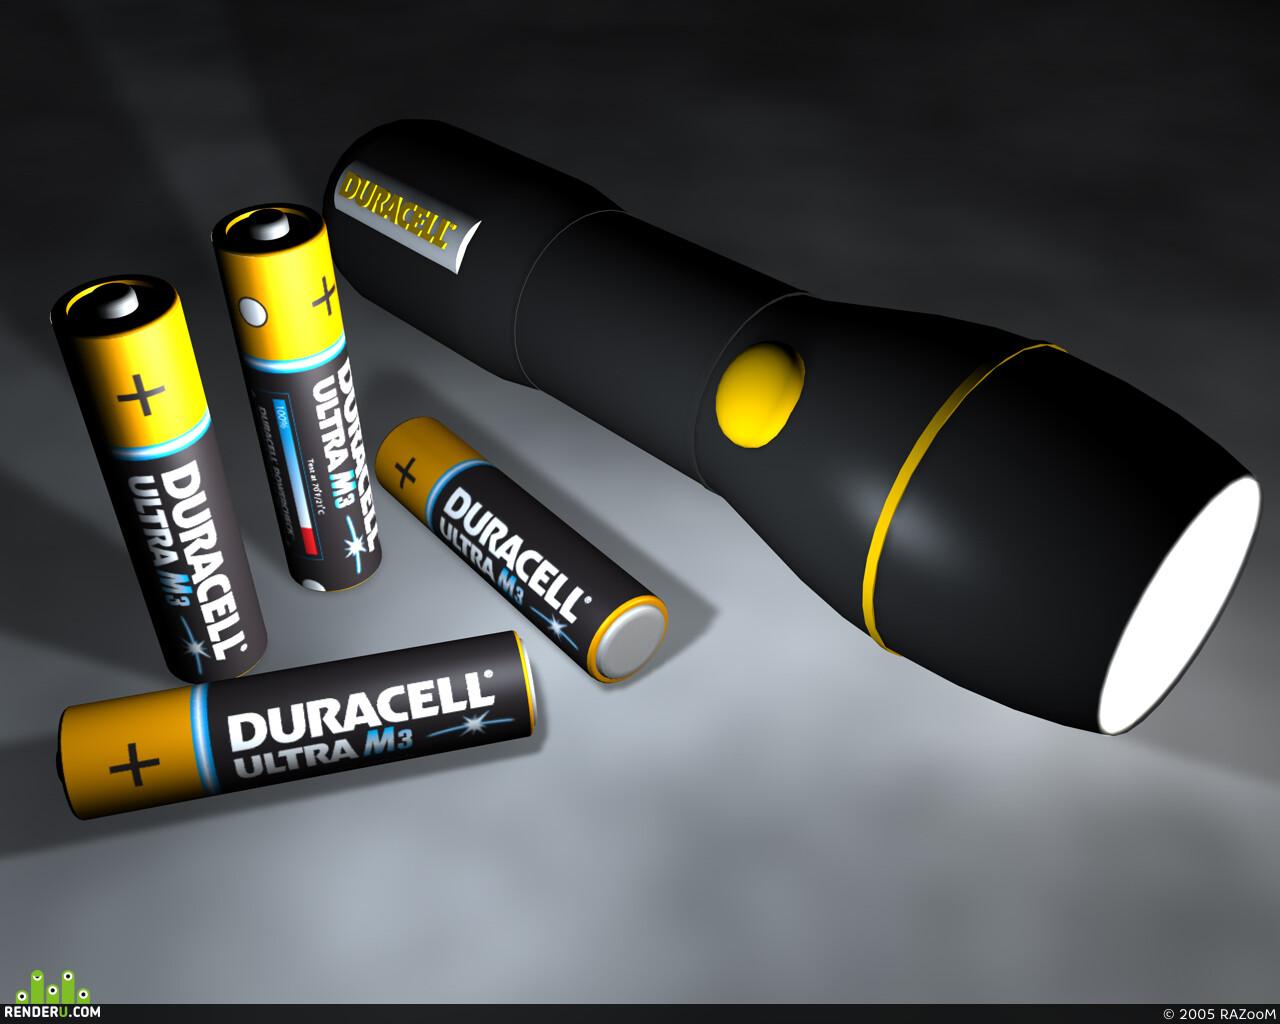 Реклама батареек в картинках